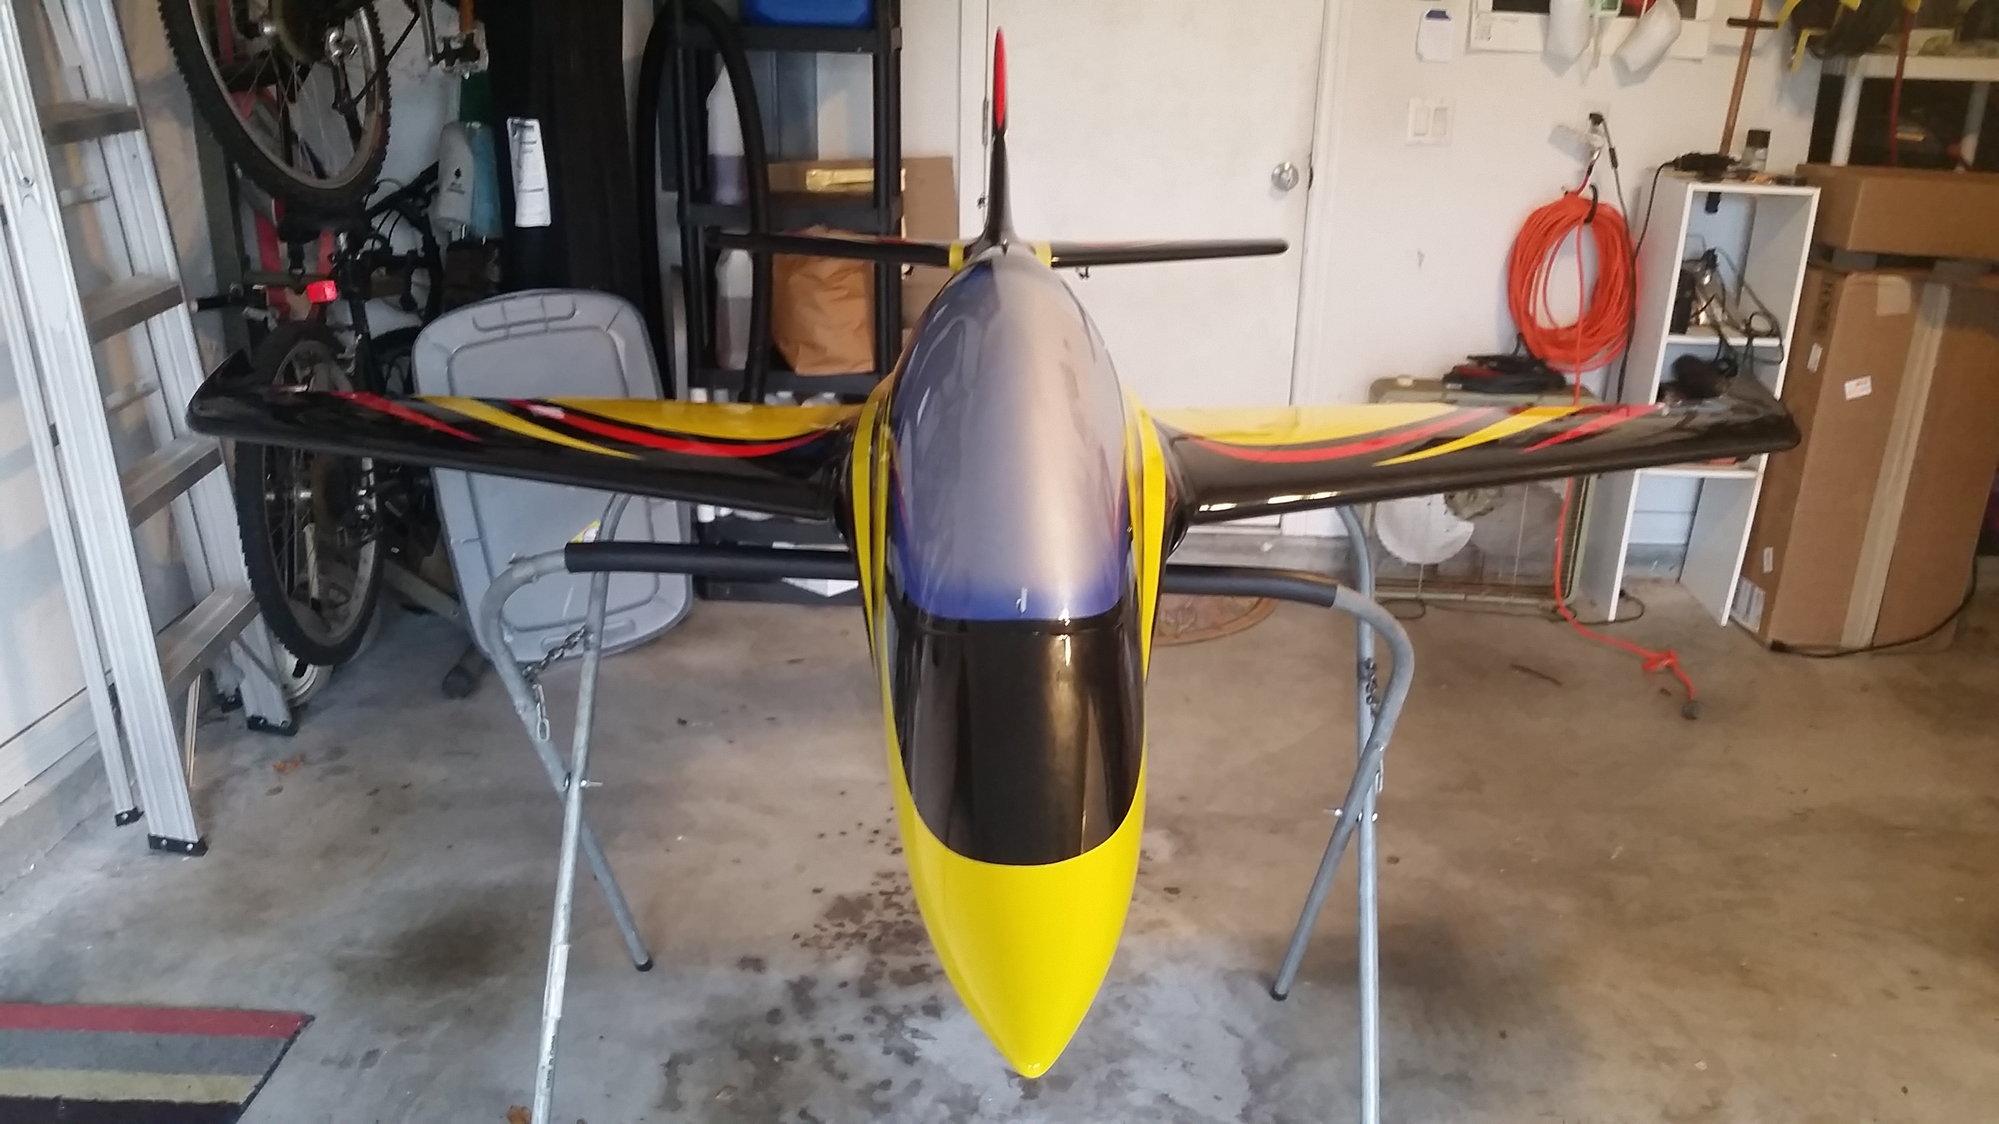 To dril a predator jet set